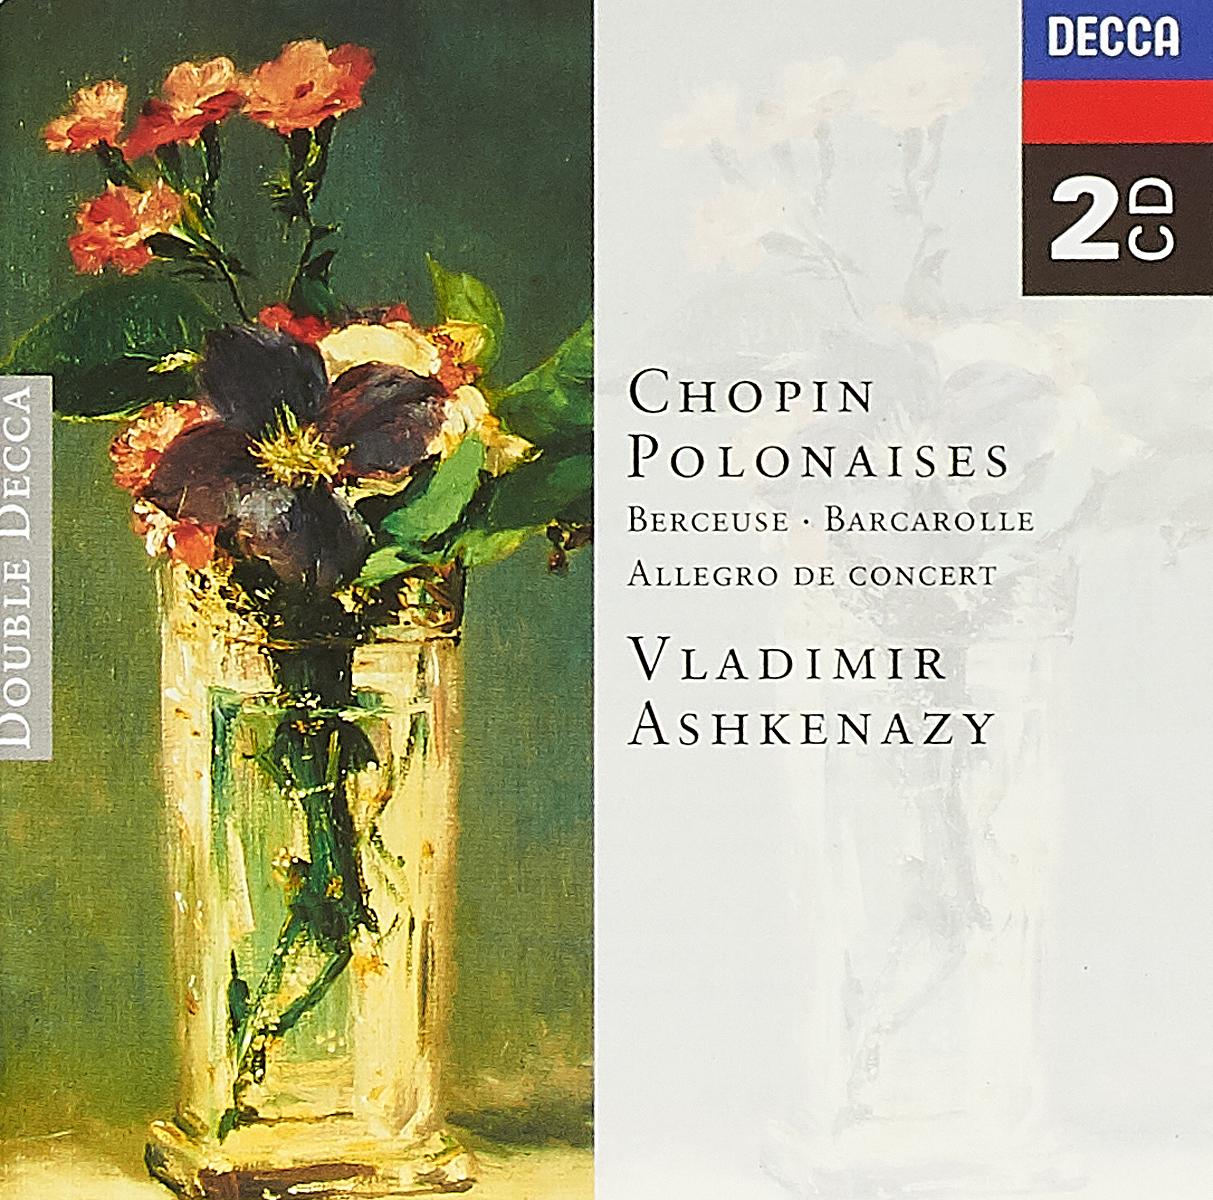 Владимир Ашкенази Vladimir Ashkenazy. Chopin: Polonaises (2 CD) владимир ашкенази вовка ашкенази vladimir ashkenazy chopin the piano works 13 cd